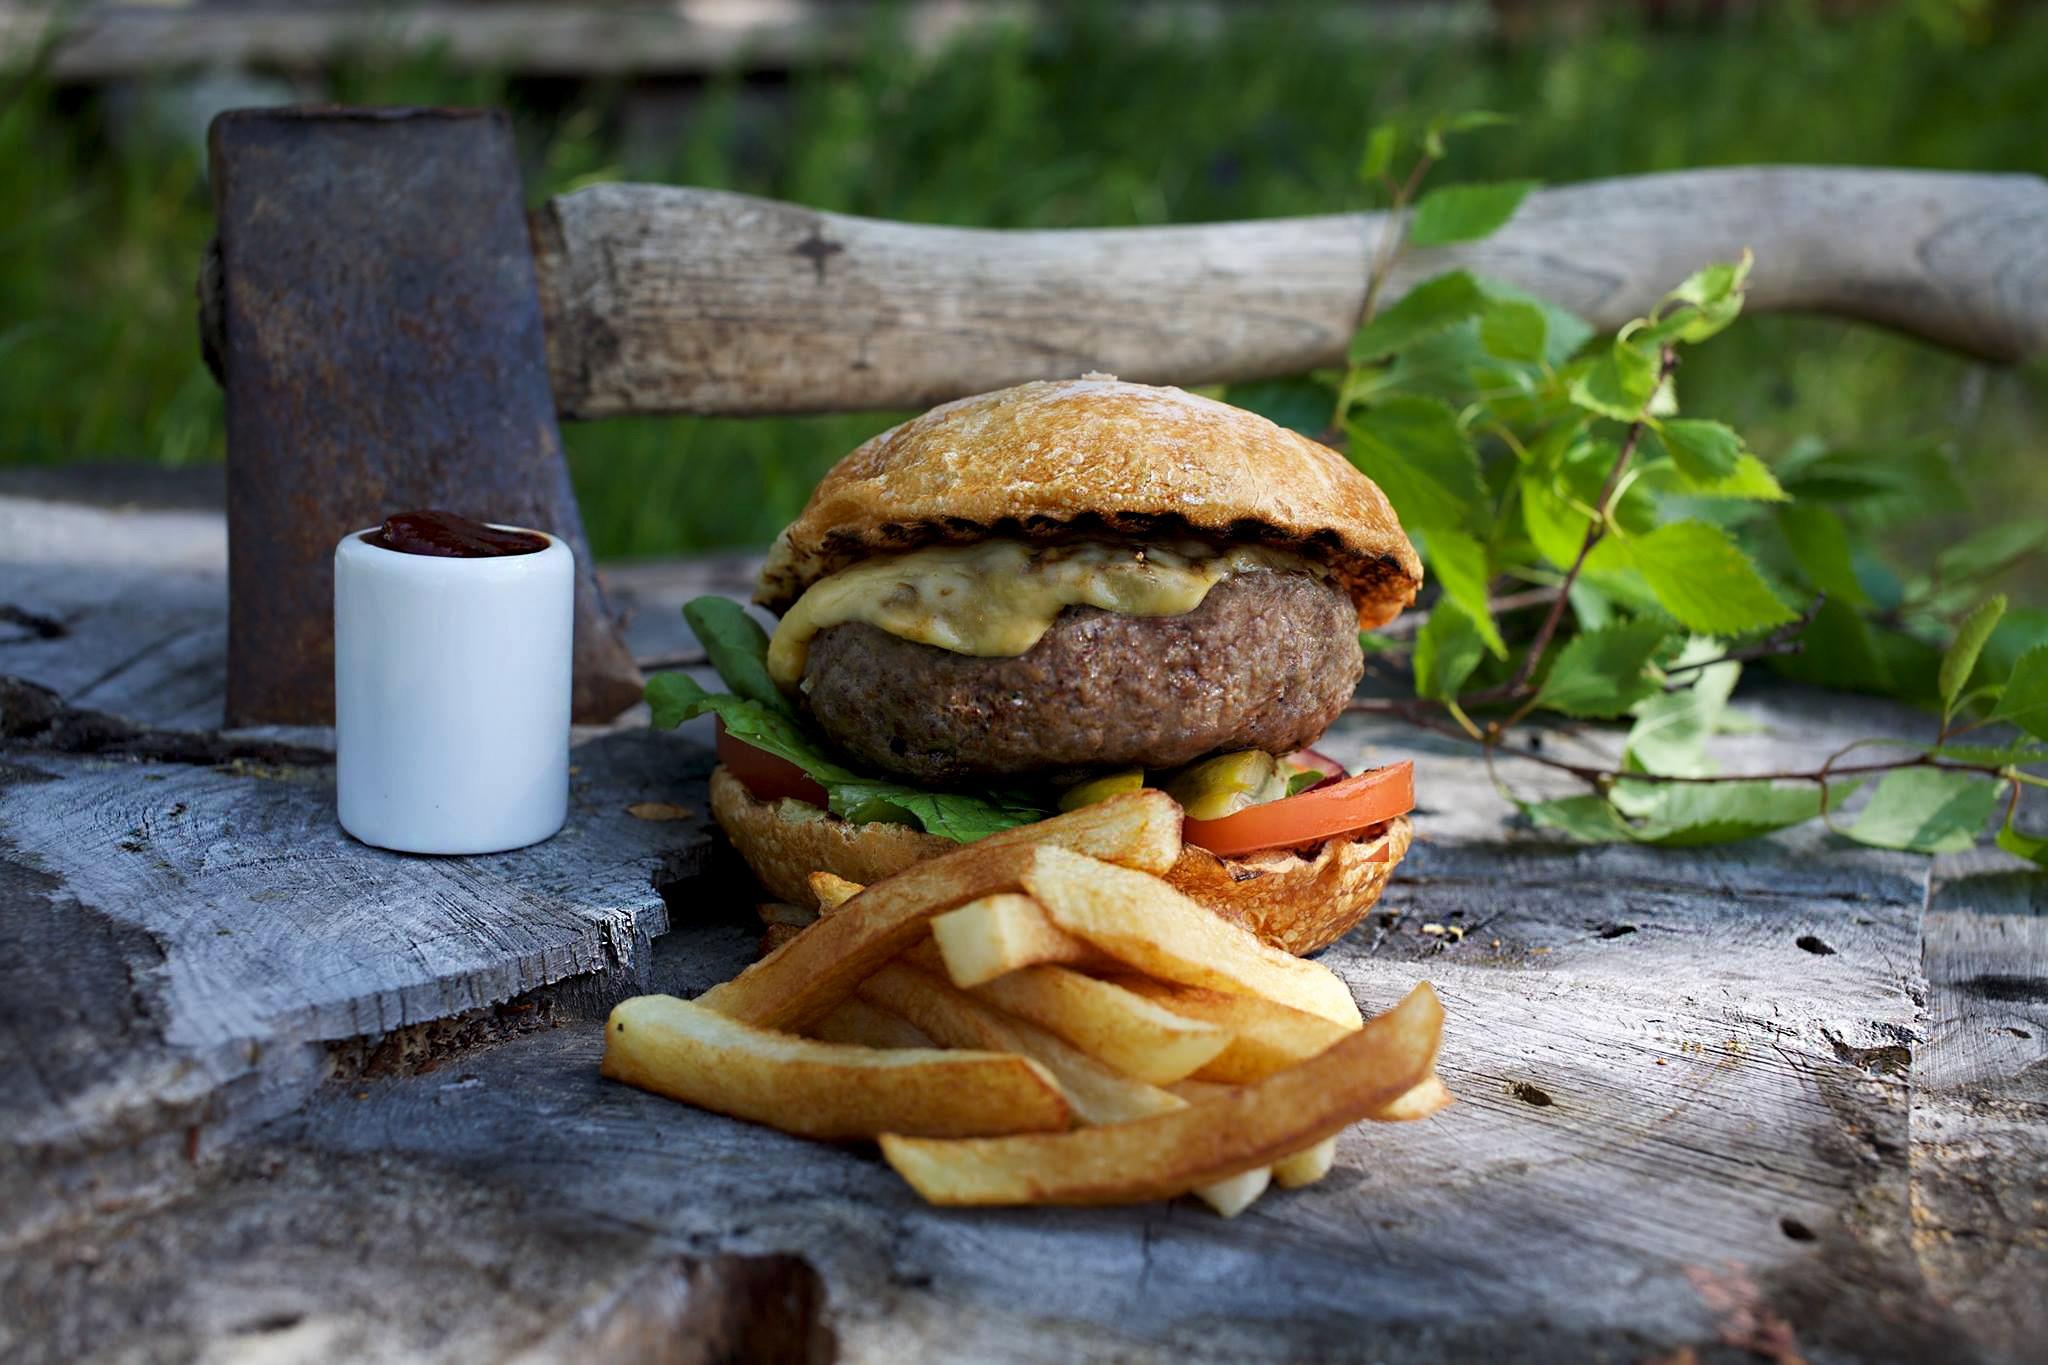 burger-charolais-gimarasten-sweden-flugfiske-giman.jpg